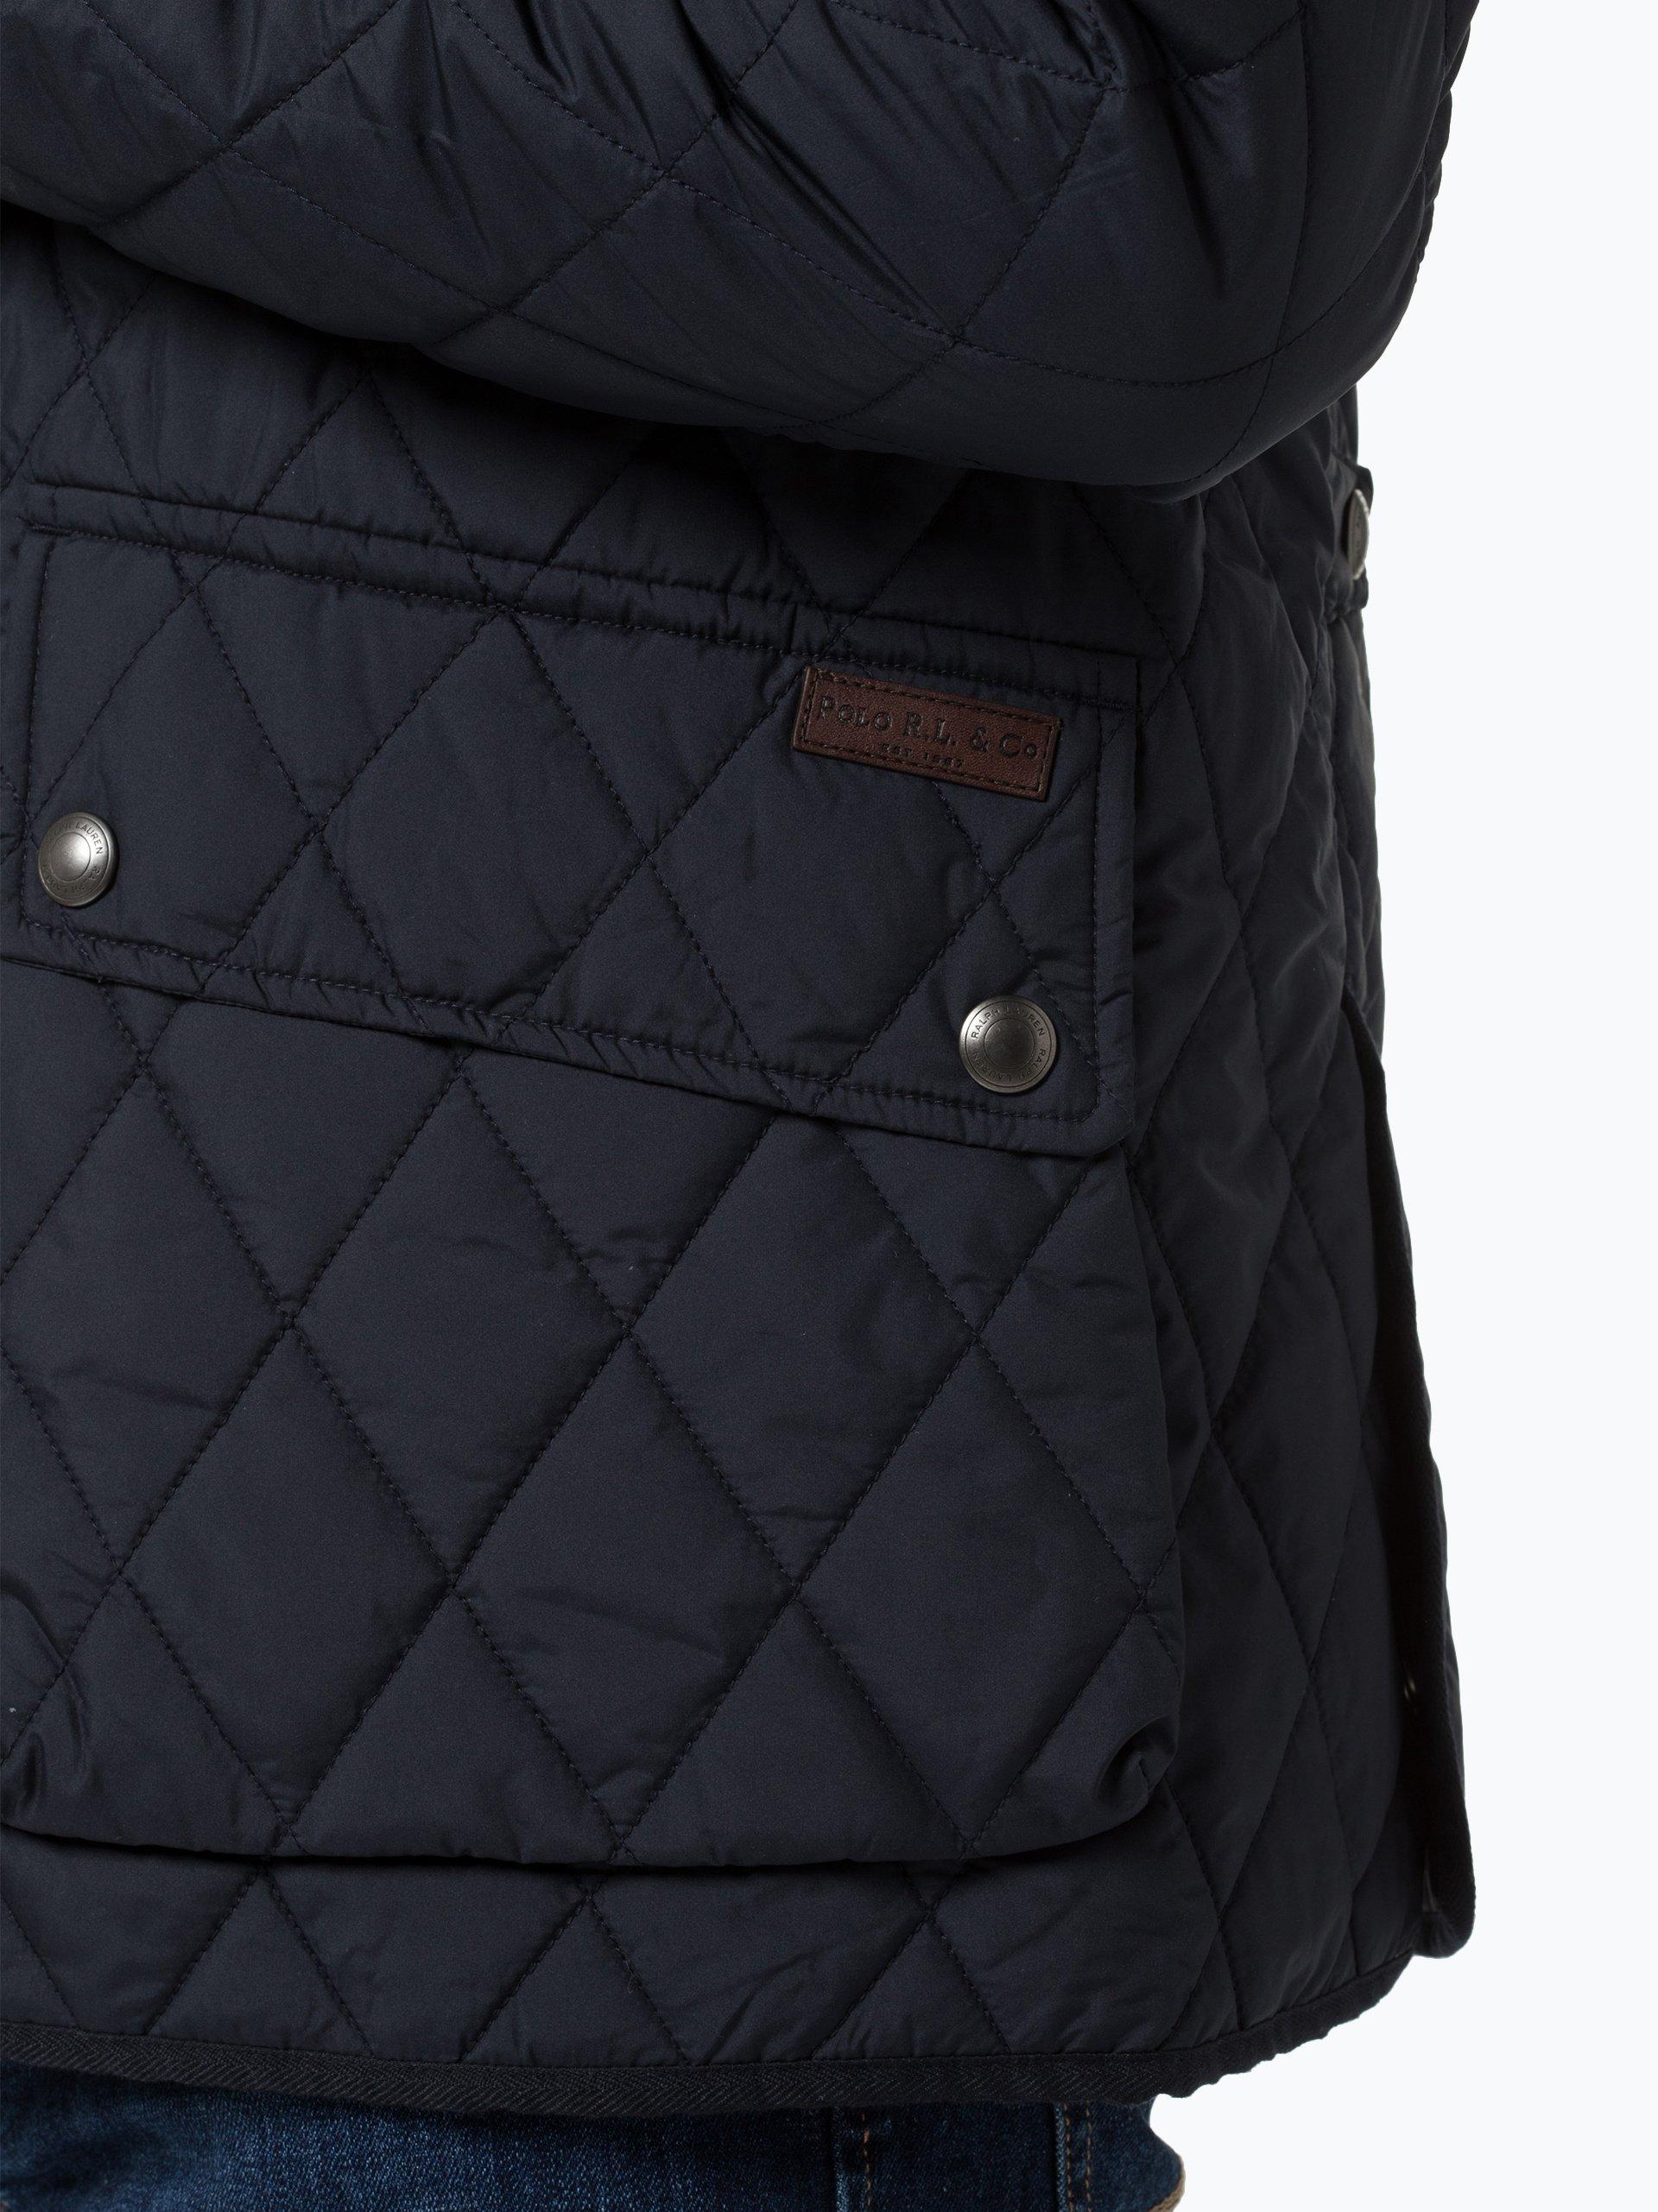 3d85a7429 Polo Ralph Lauren Męska kurtka pikowana – Kempton kup online ...